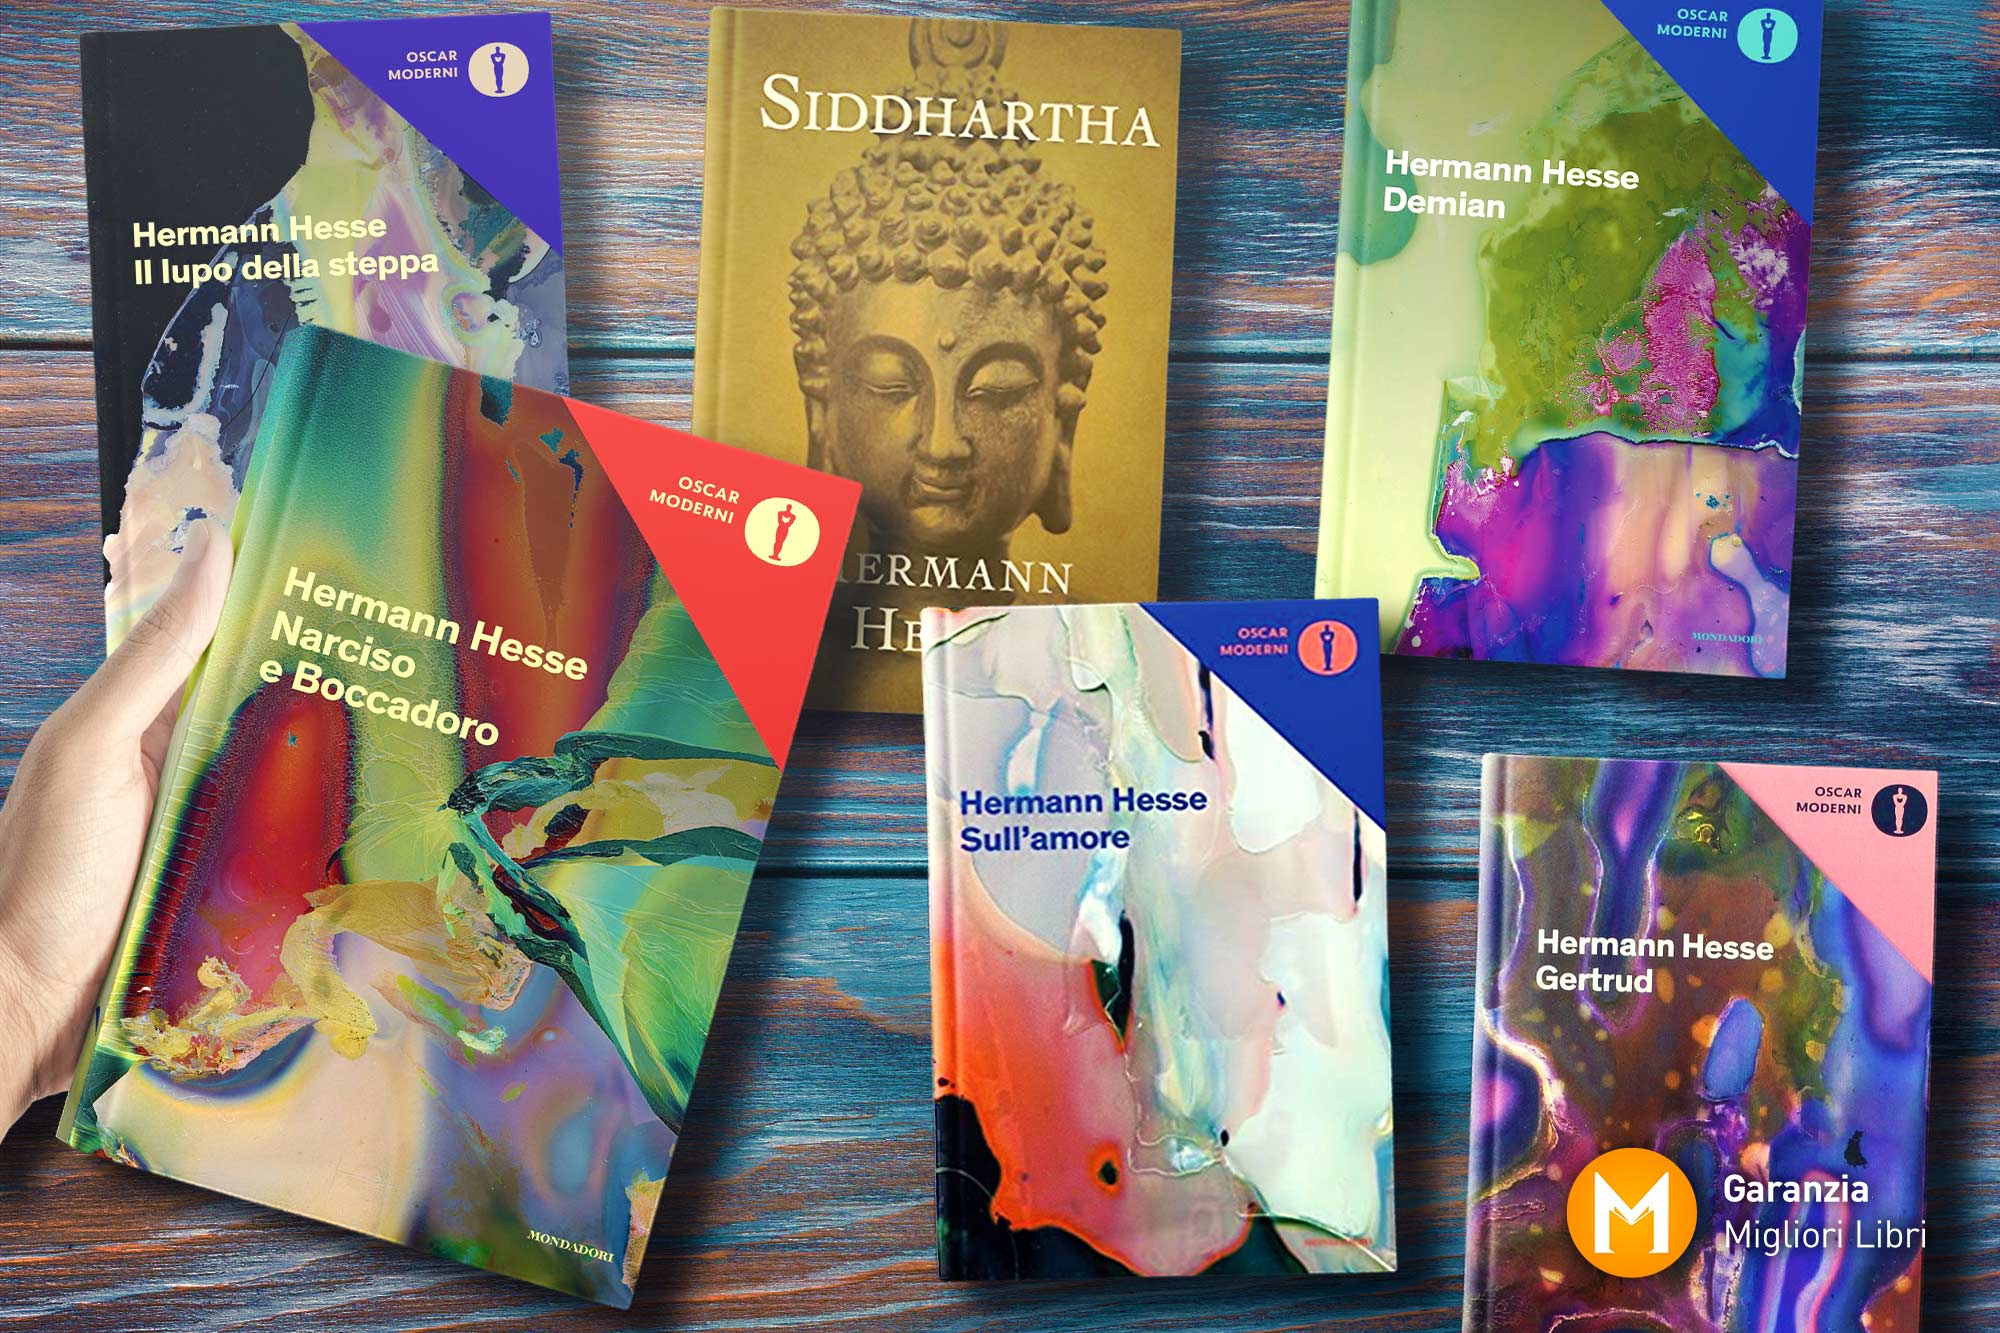 libri-herman-hesse-migliori